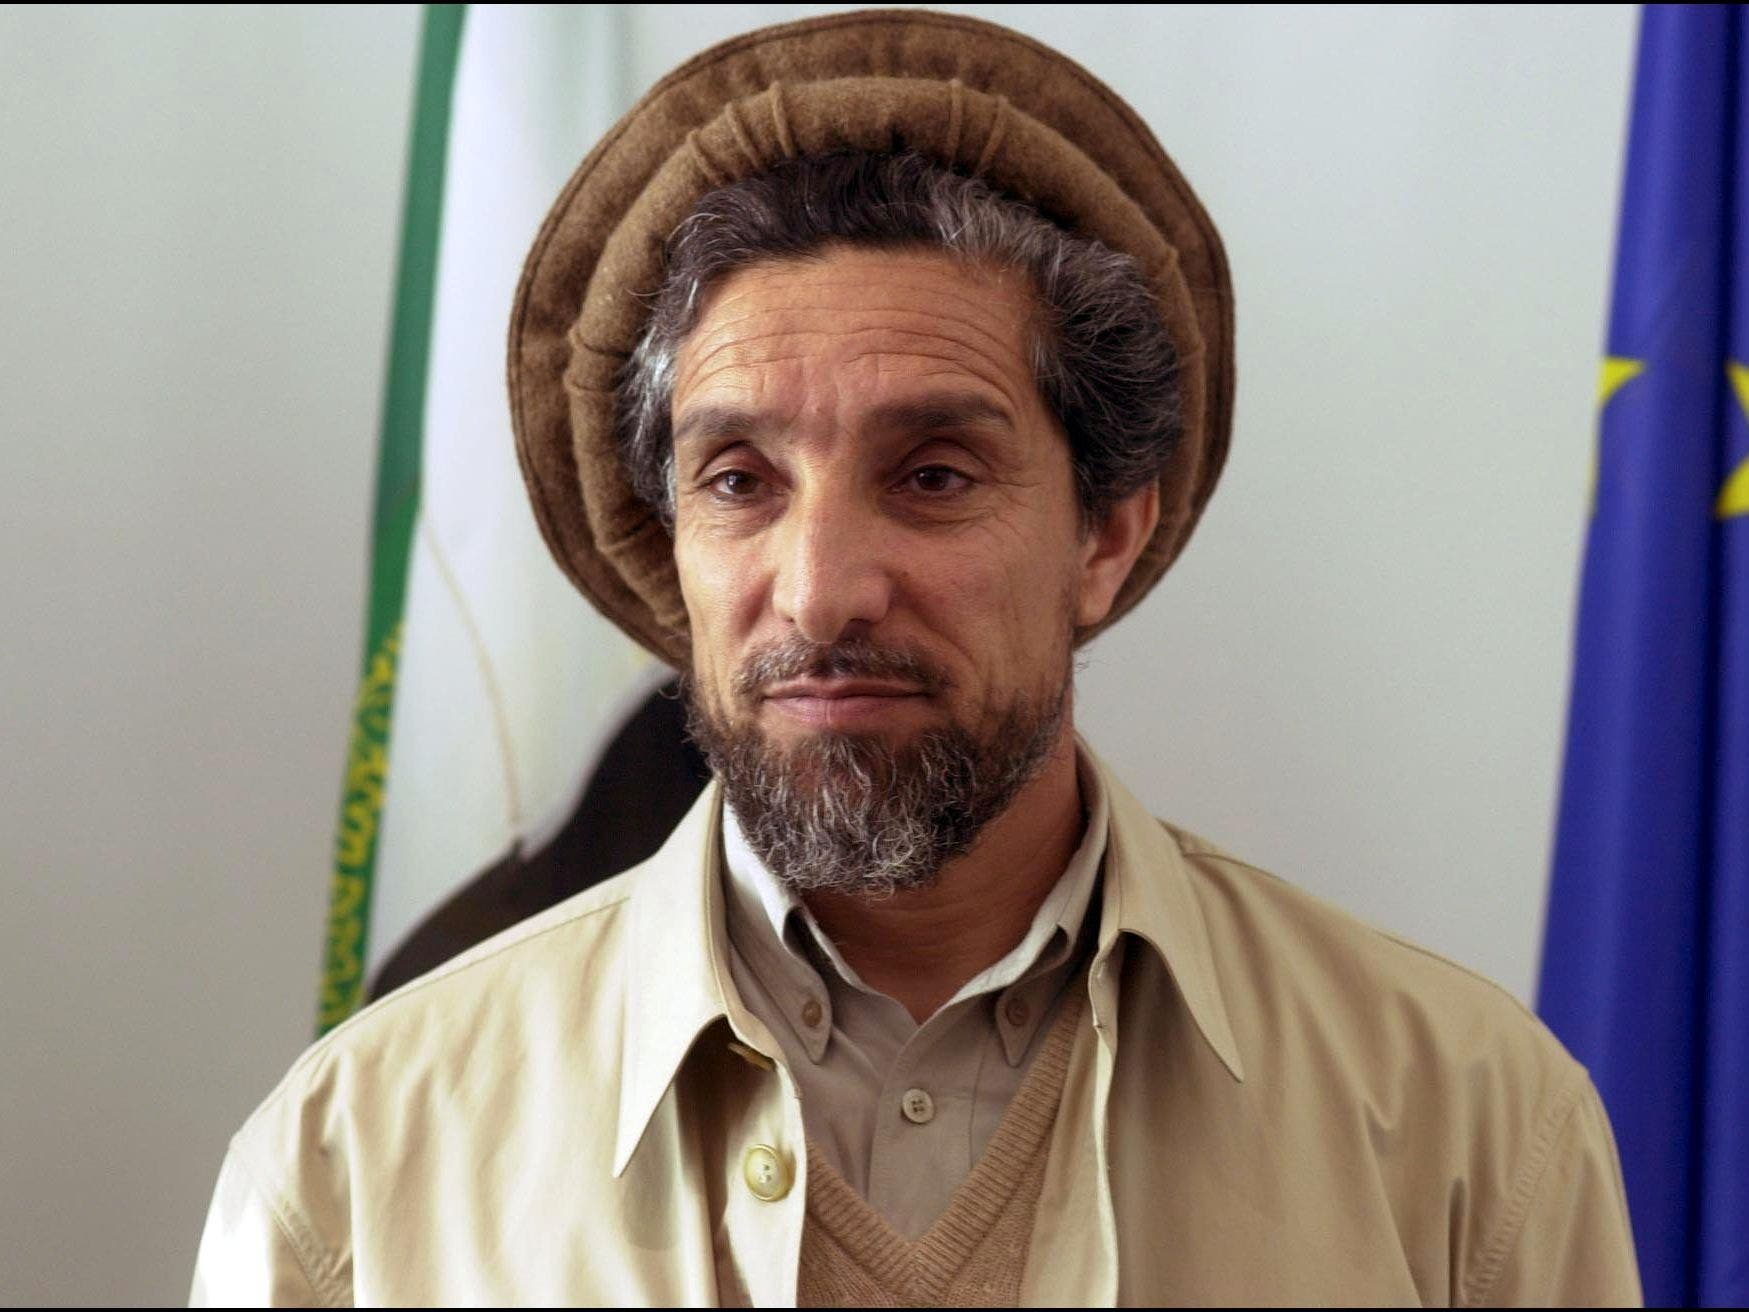 Ahmed Shah Massoud